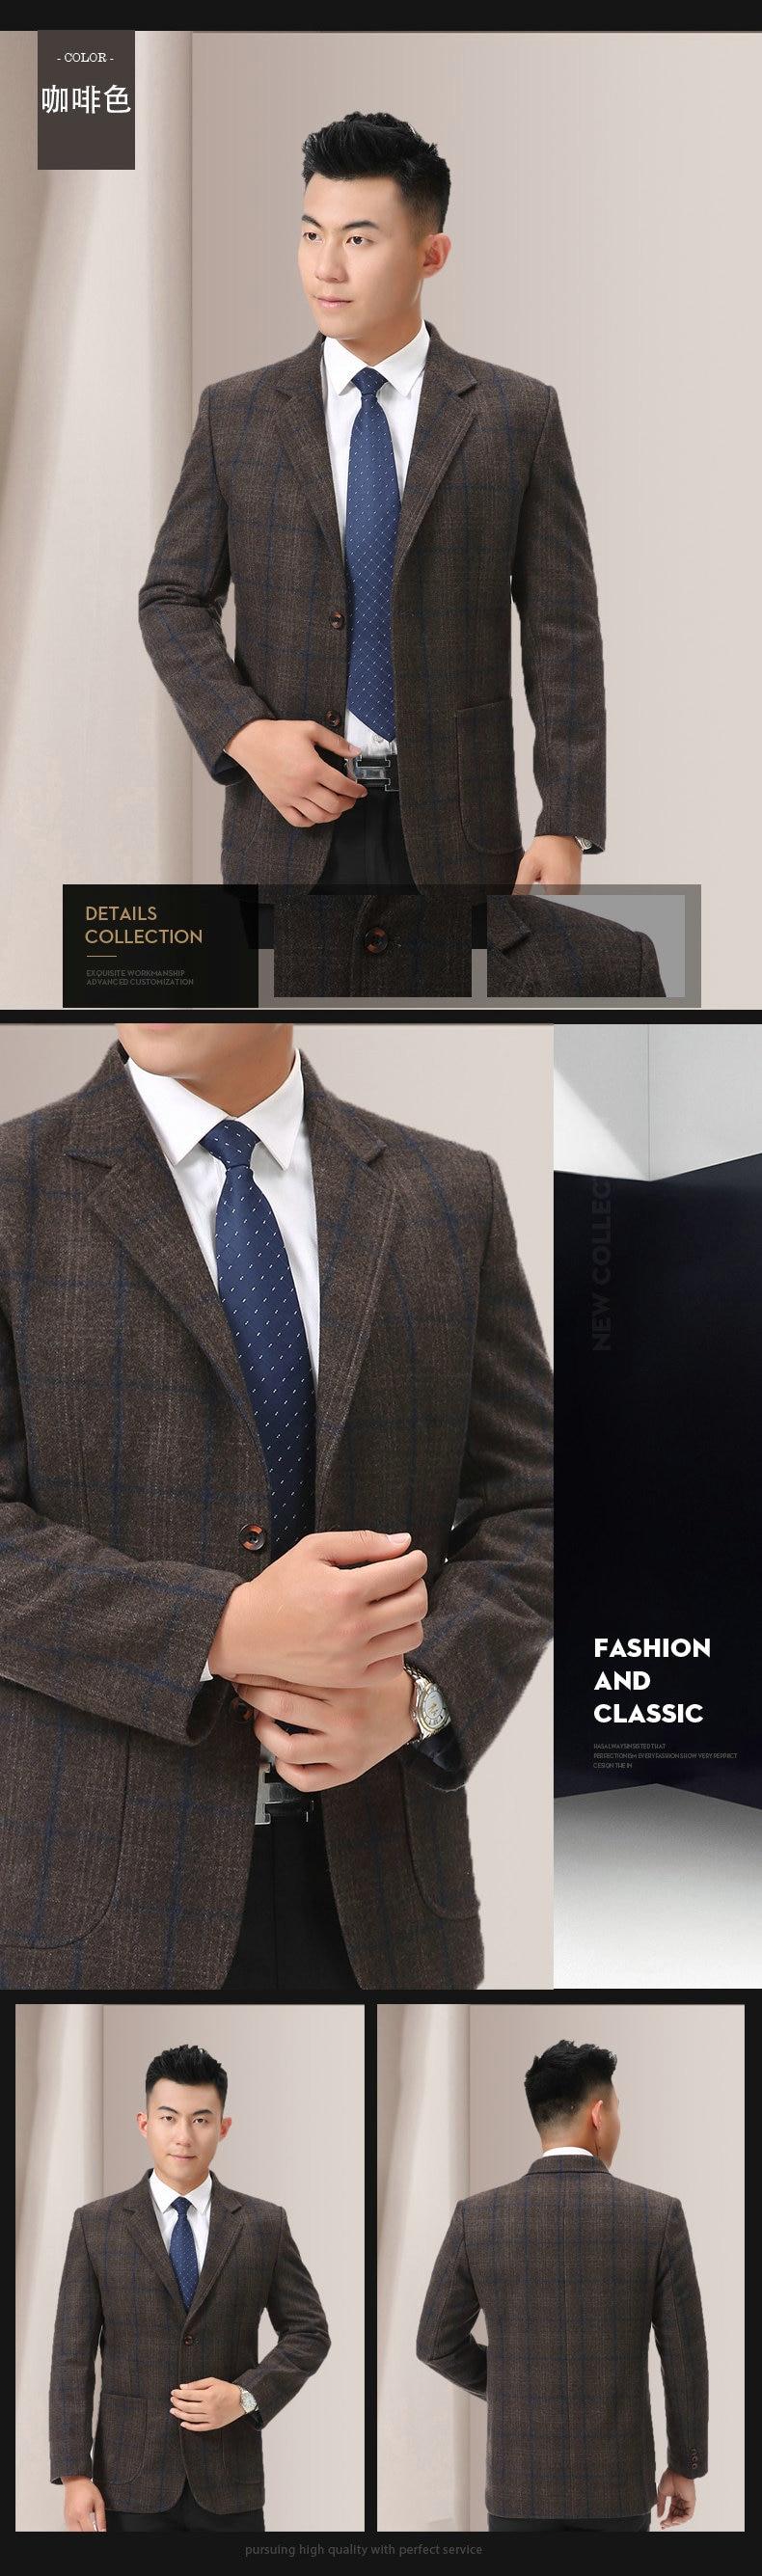 WAEOLSA Man Wool Blazer Plaid Jacket Suit Men Woollen Blends Garment Male Smart Casual Balzers Black Gray Jacket Suit Man (9)